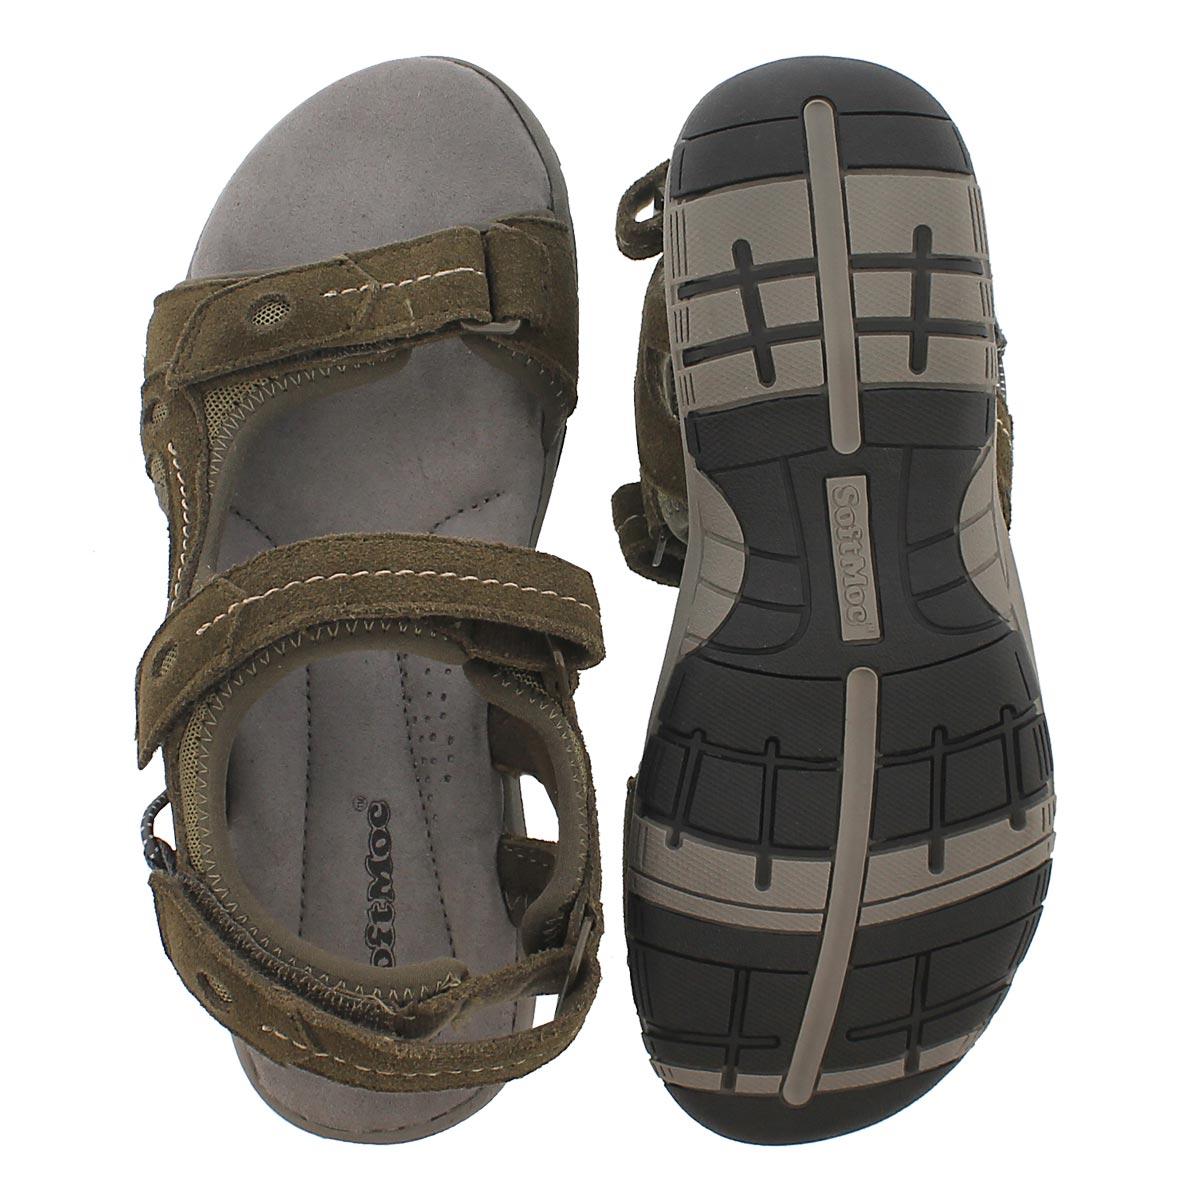 Sandale msse visc. Gladys, kaki, femmes